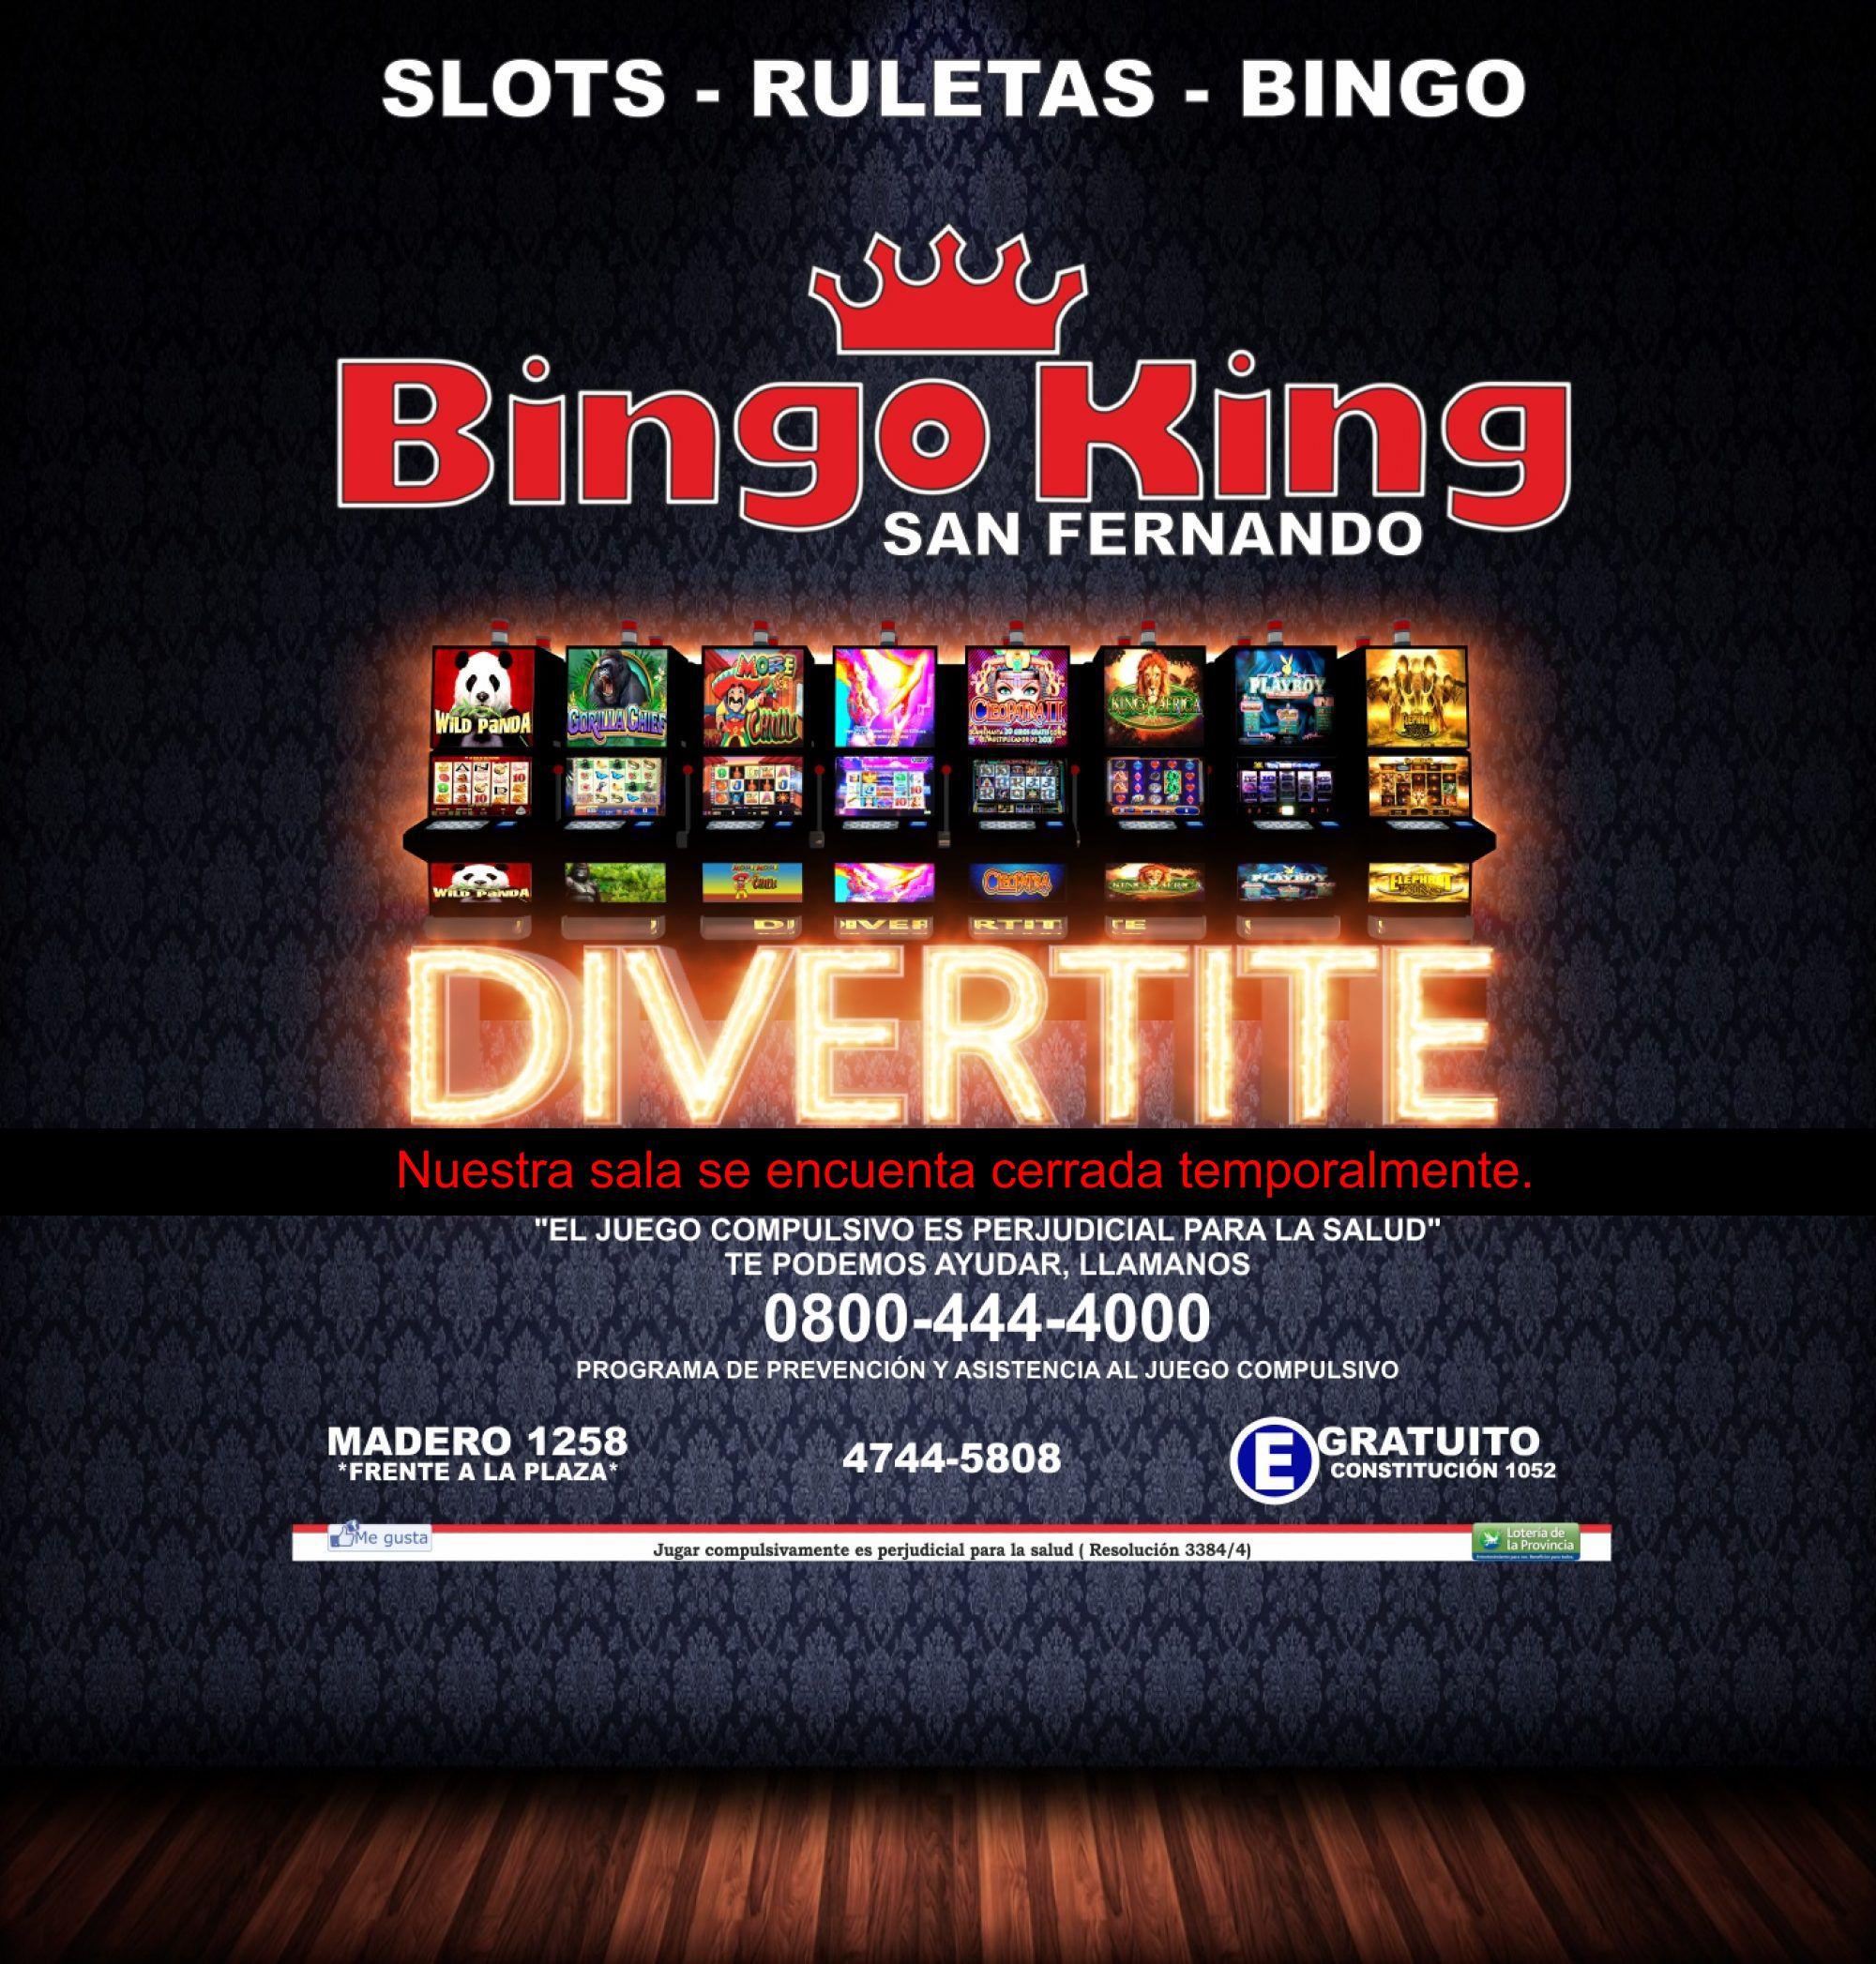 Bingo King S.A.